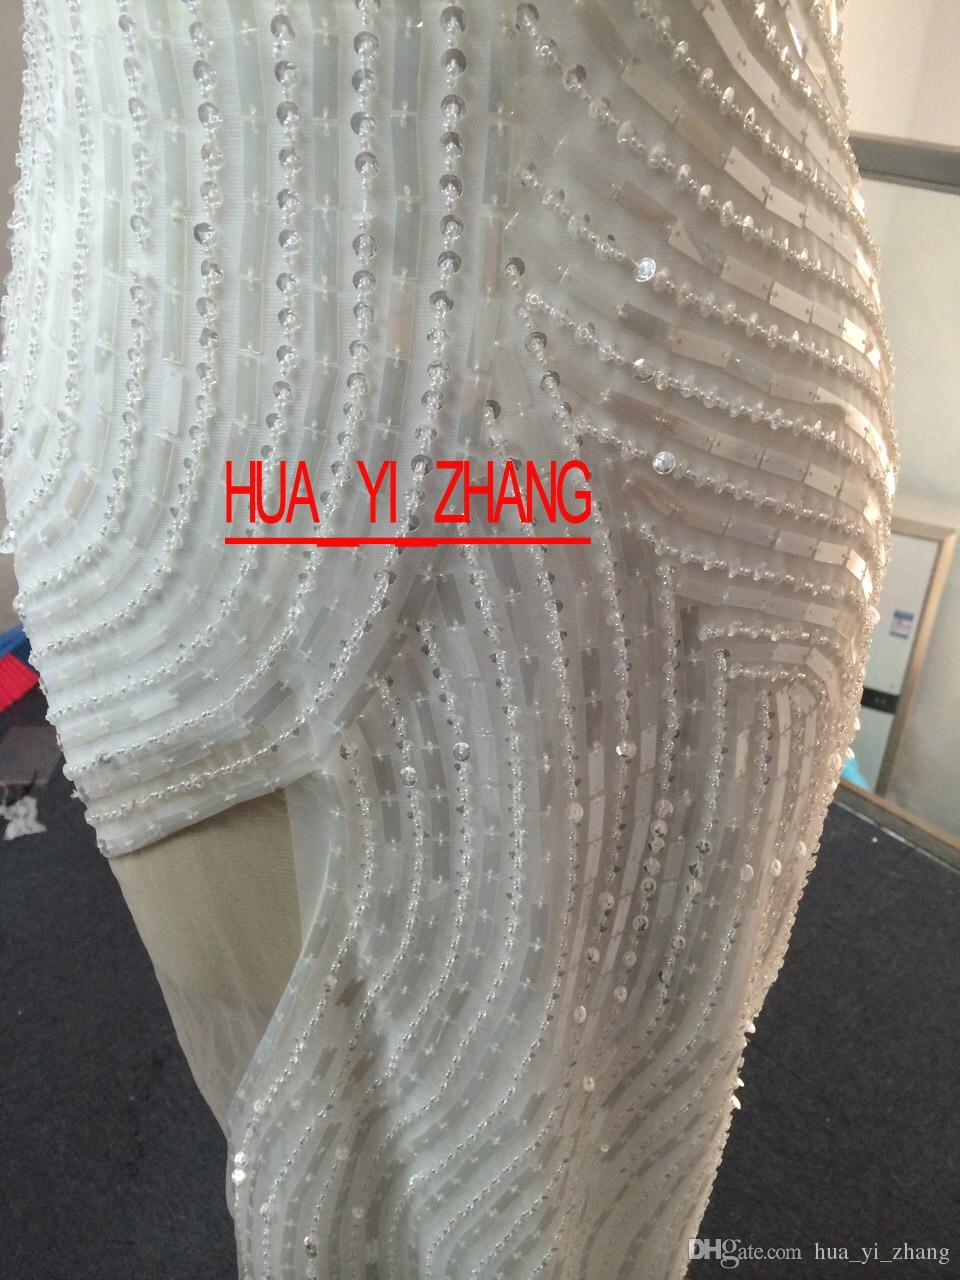 2015 Suknie wieczorowe Bling Bling Vestidos de Fiesta Cekiny Luksusowe Zroszony Organza Tulle Suknie Wieczorowe Dhyz 01